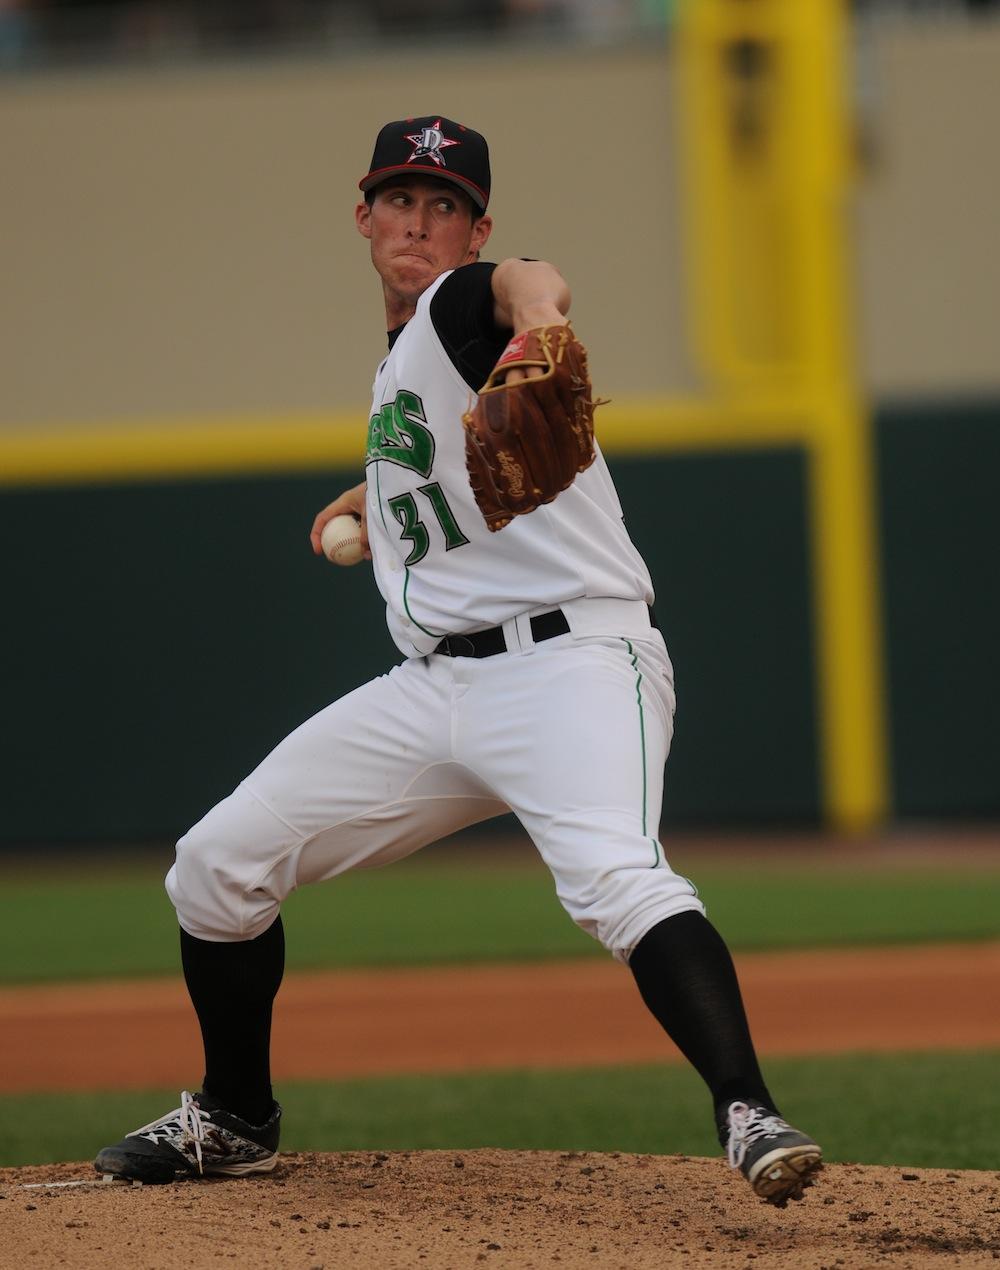 Dan Langfield, Photo Credit: Dayton Dragons